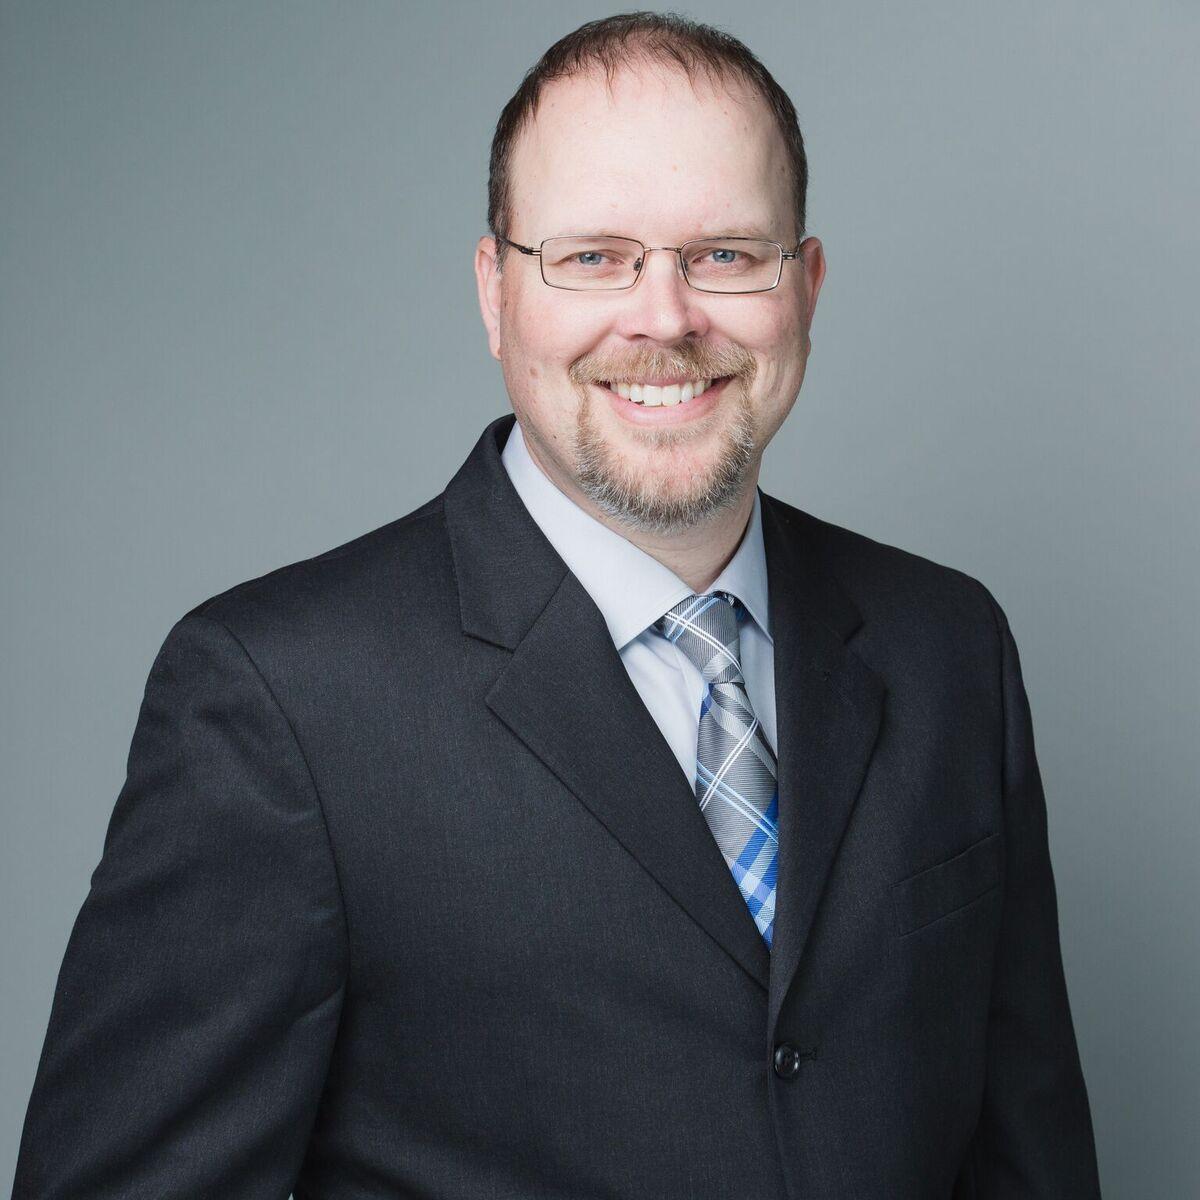 Chris Tyberg